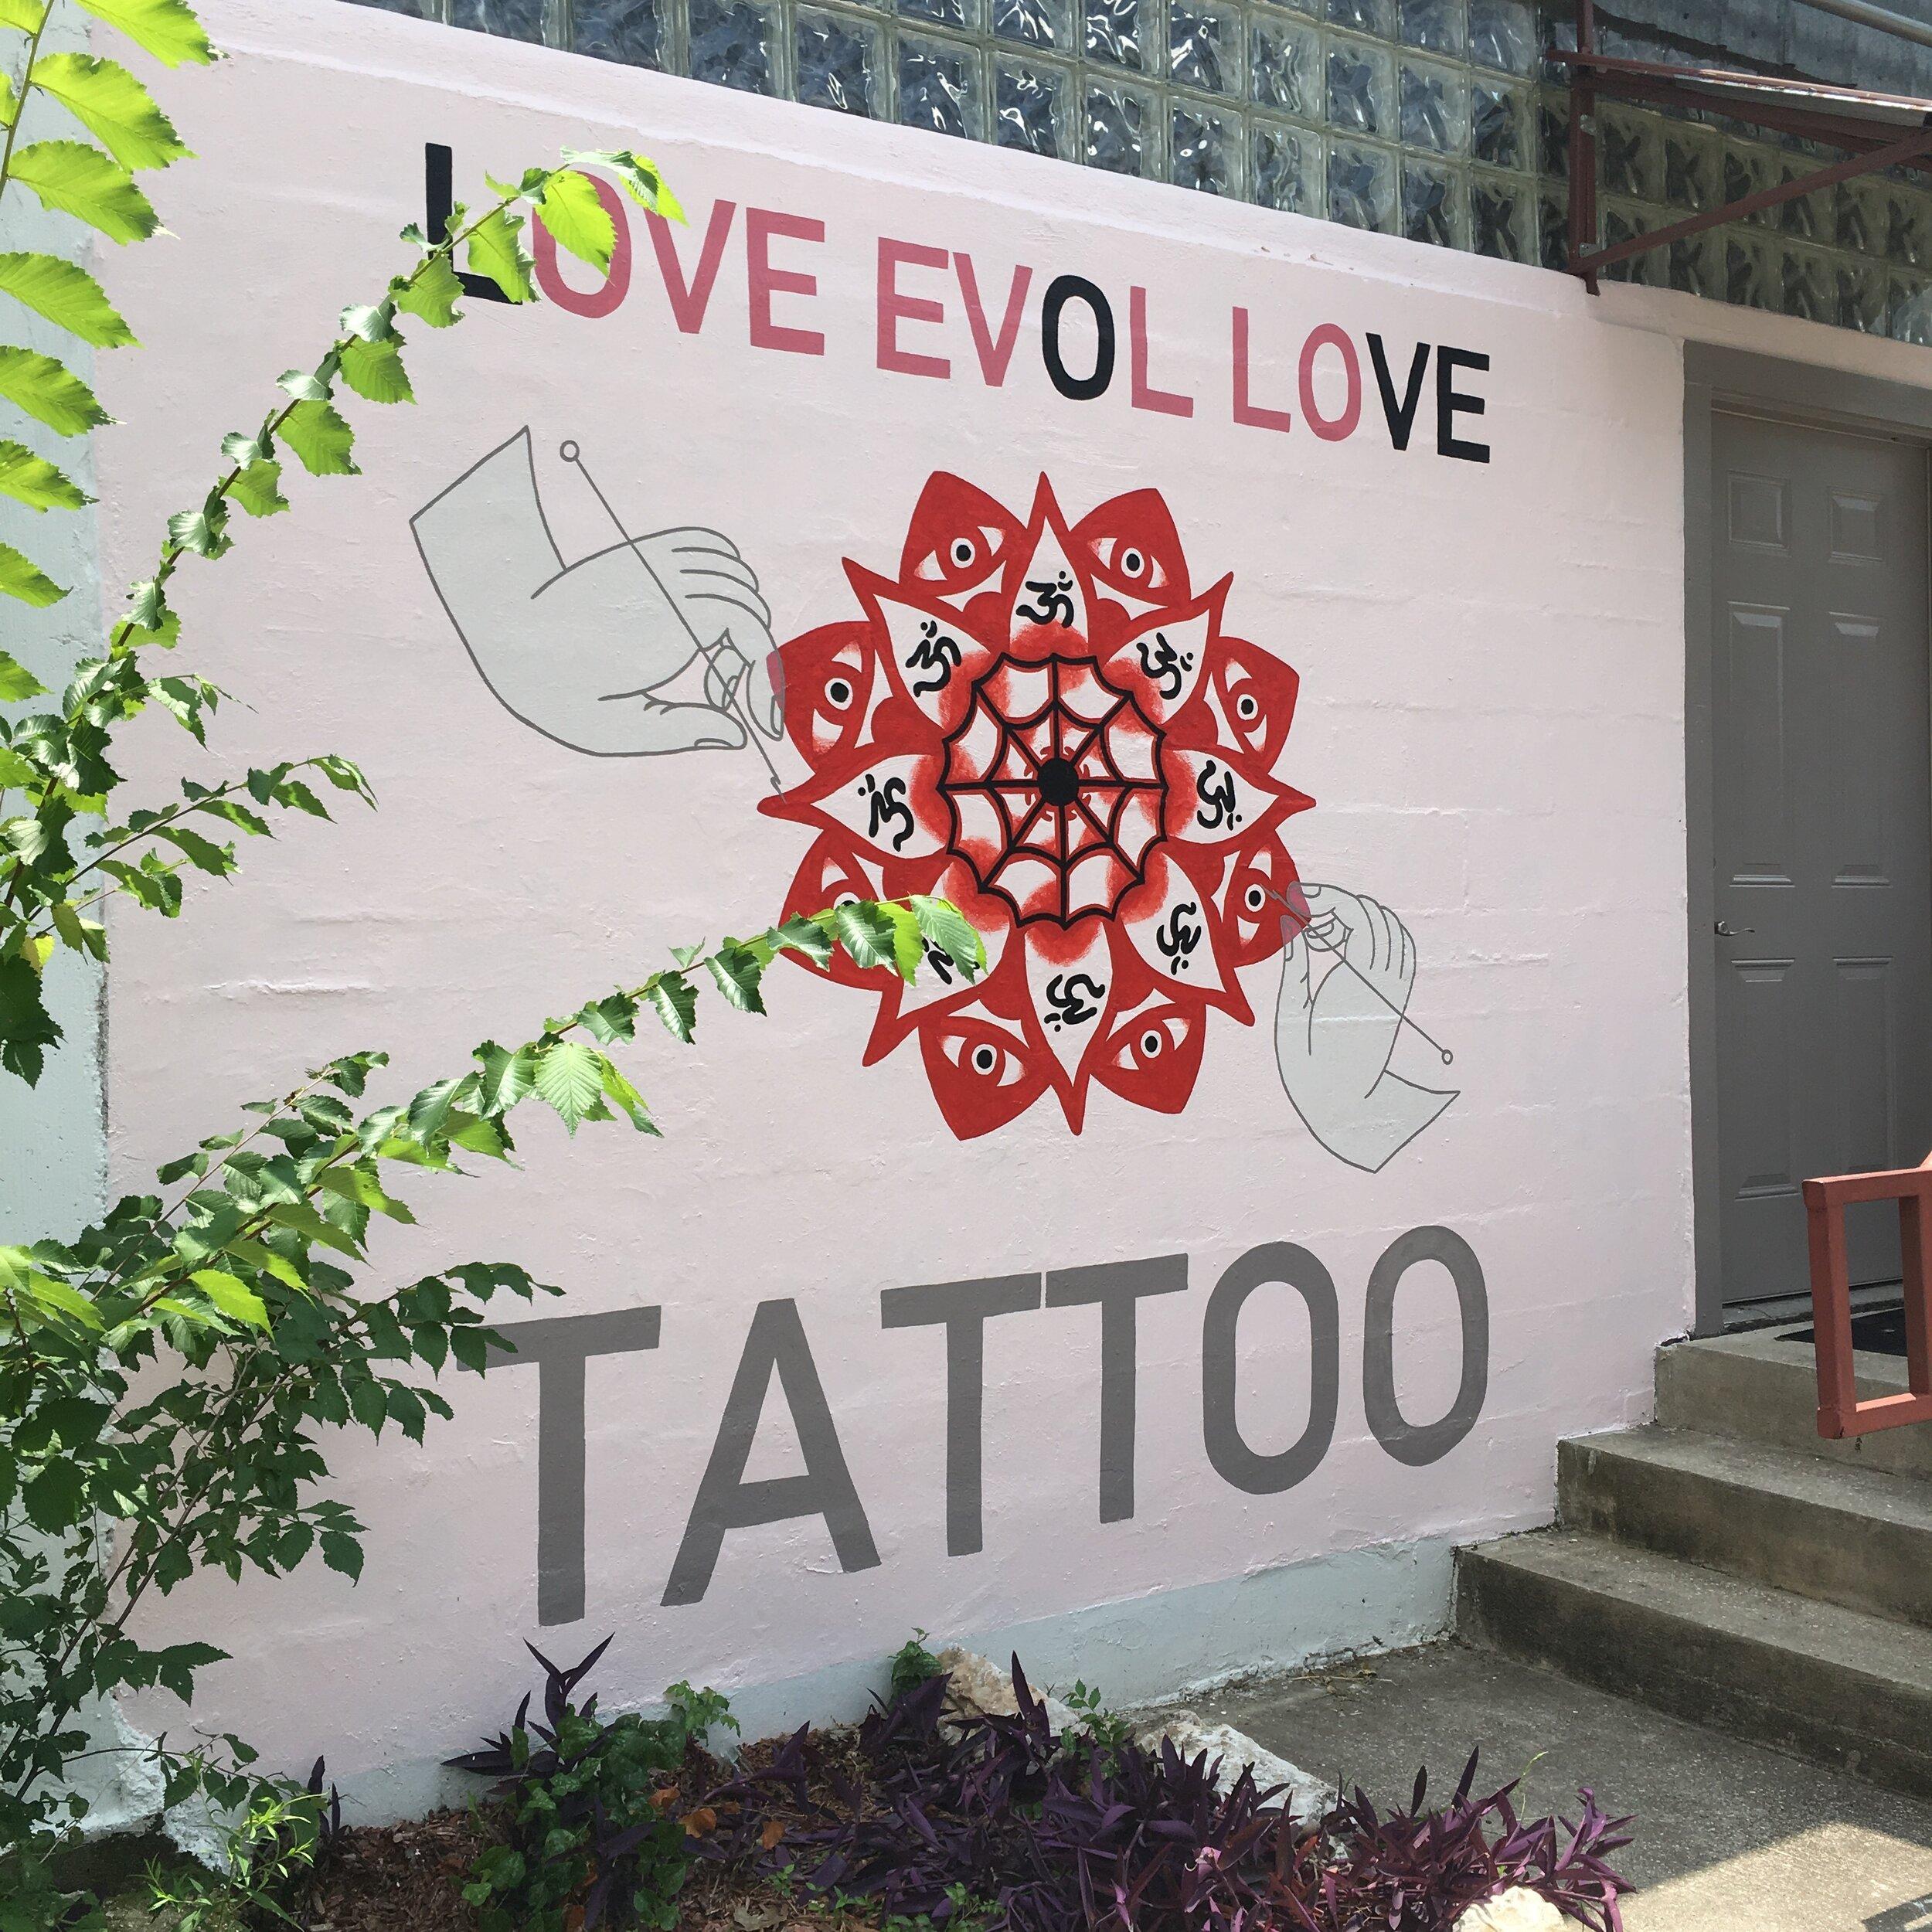 Love Evol Love Tattoo Shop Mural, Austin